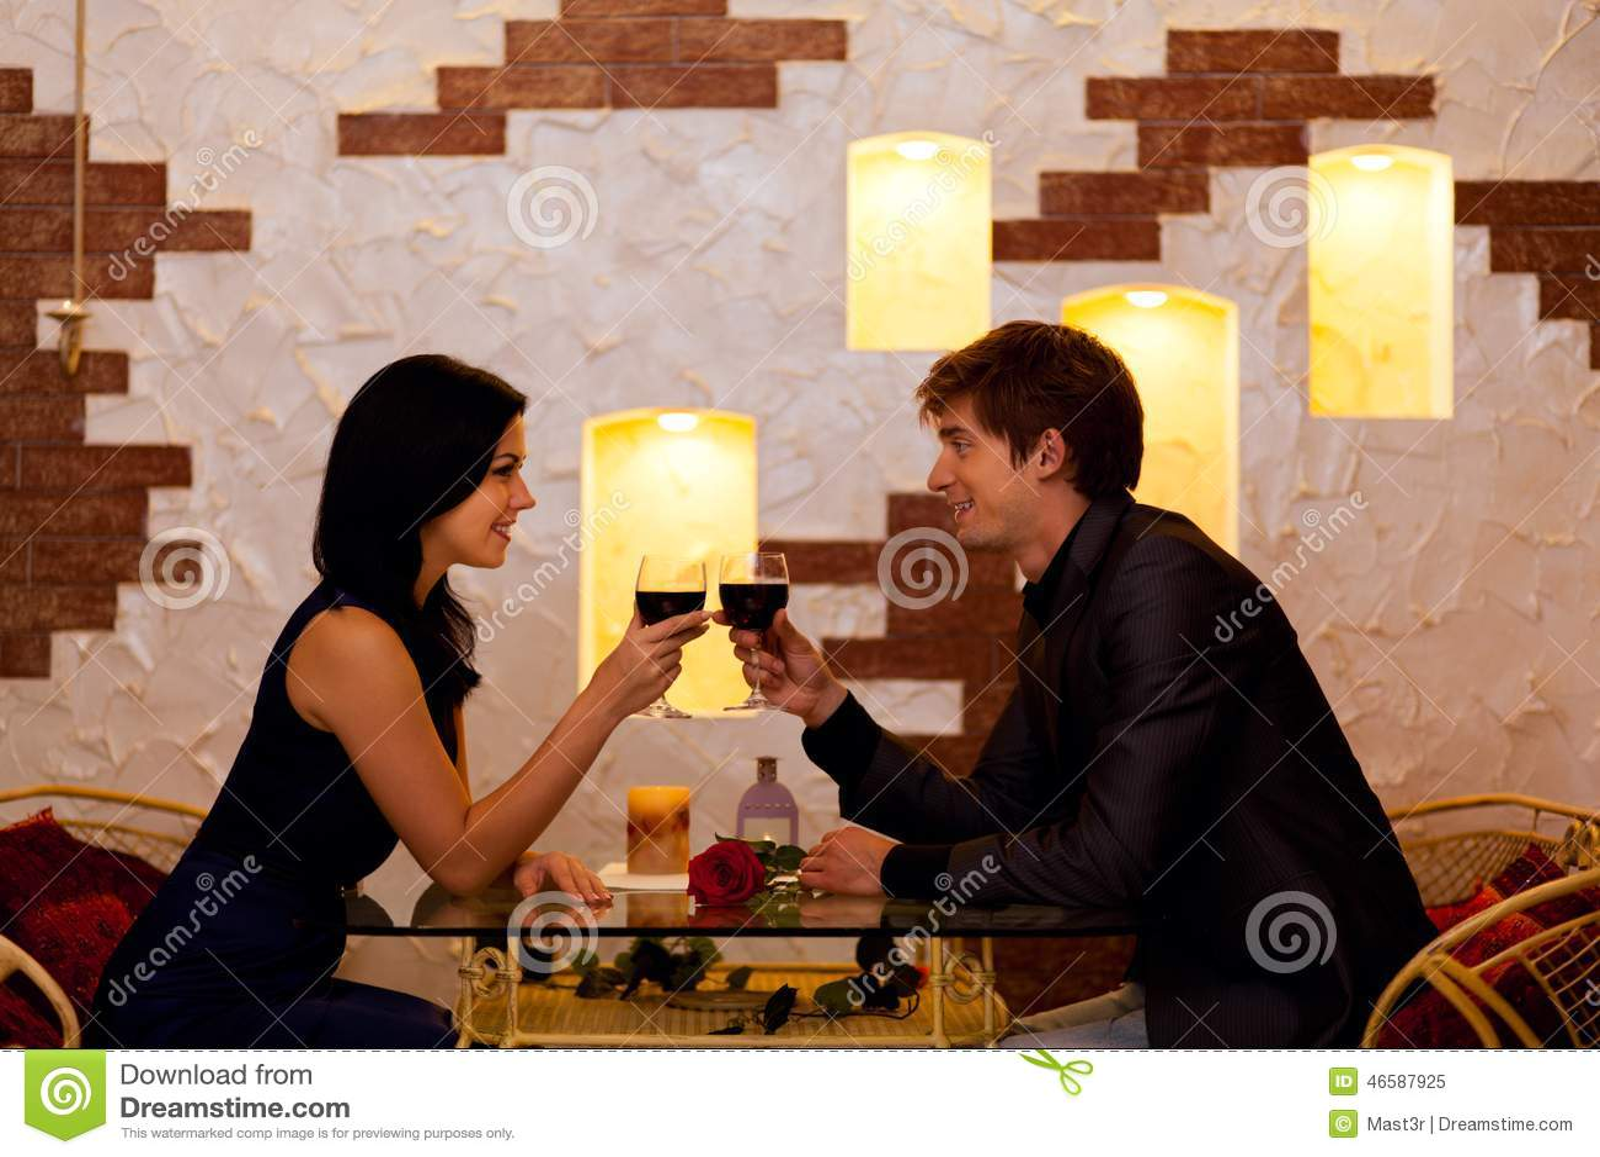 Light dating